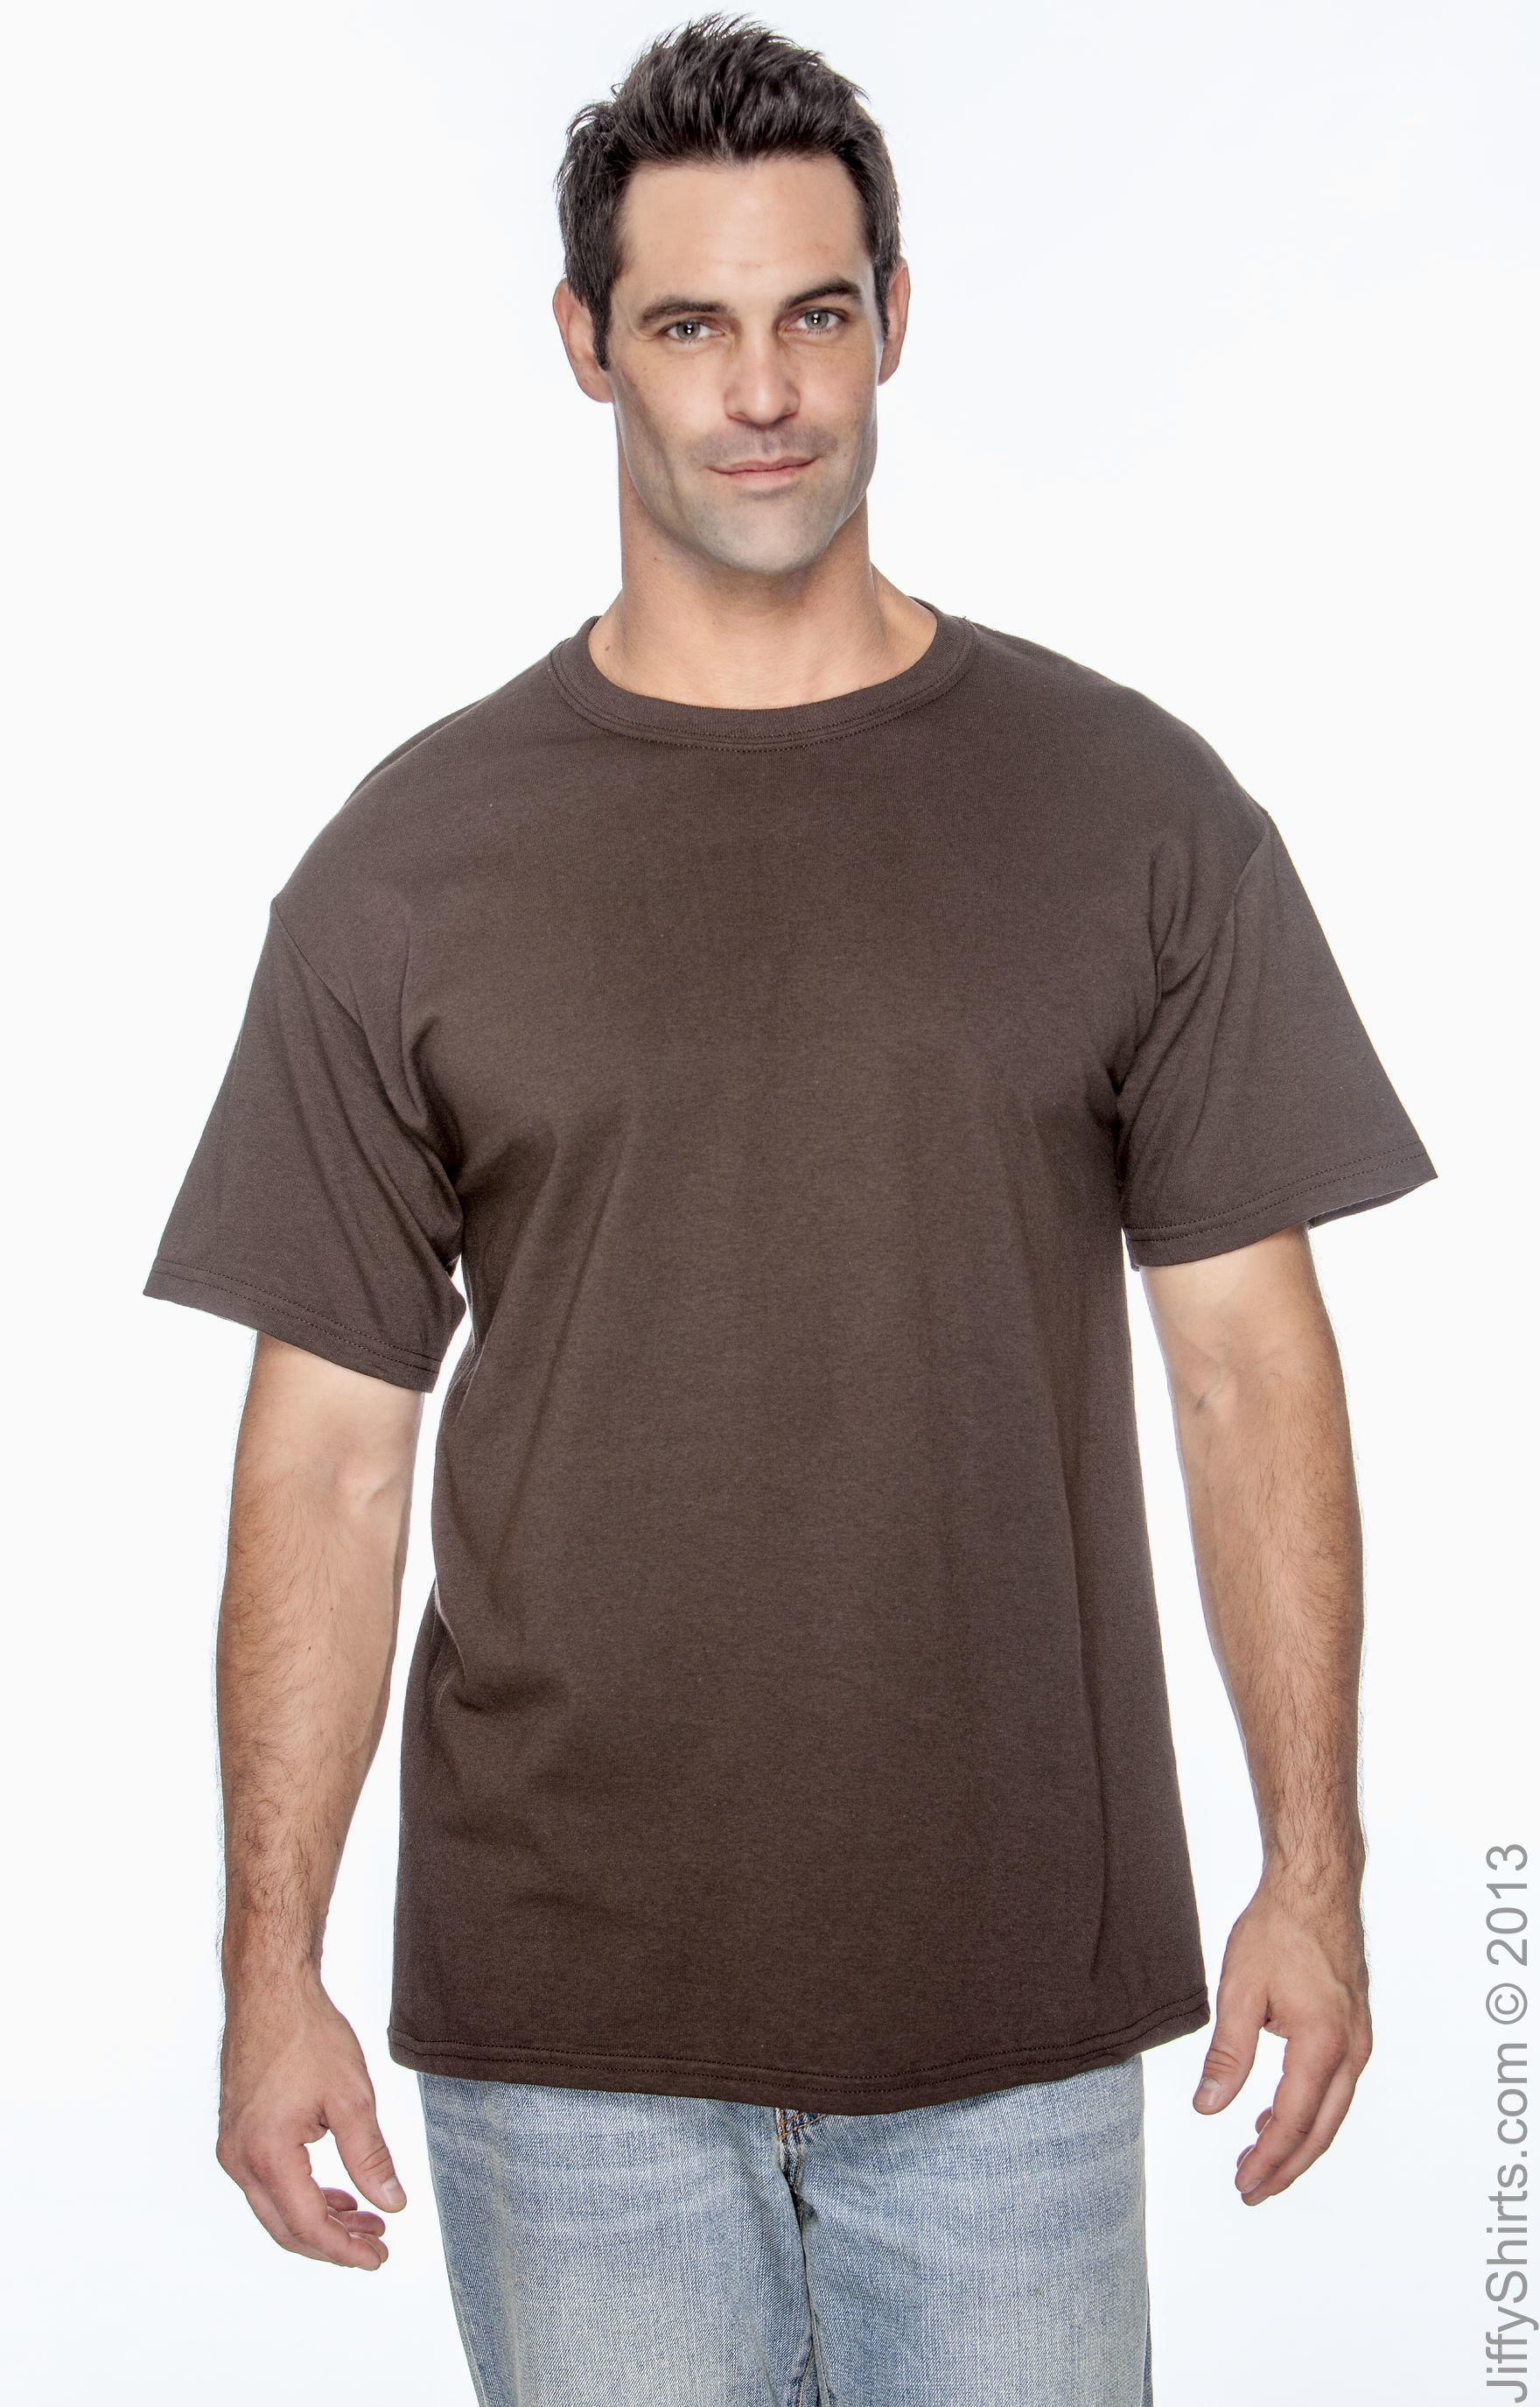 Vintage Athletic Football Shirt